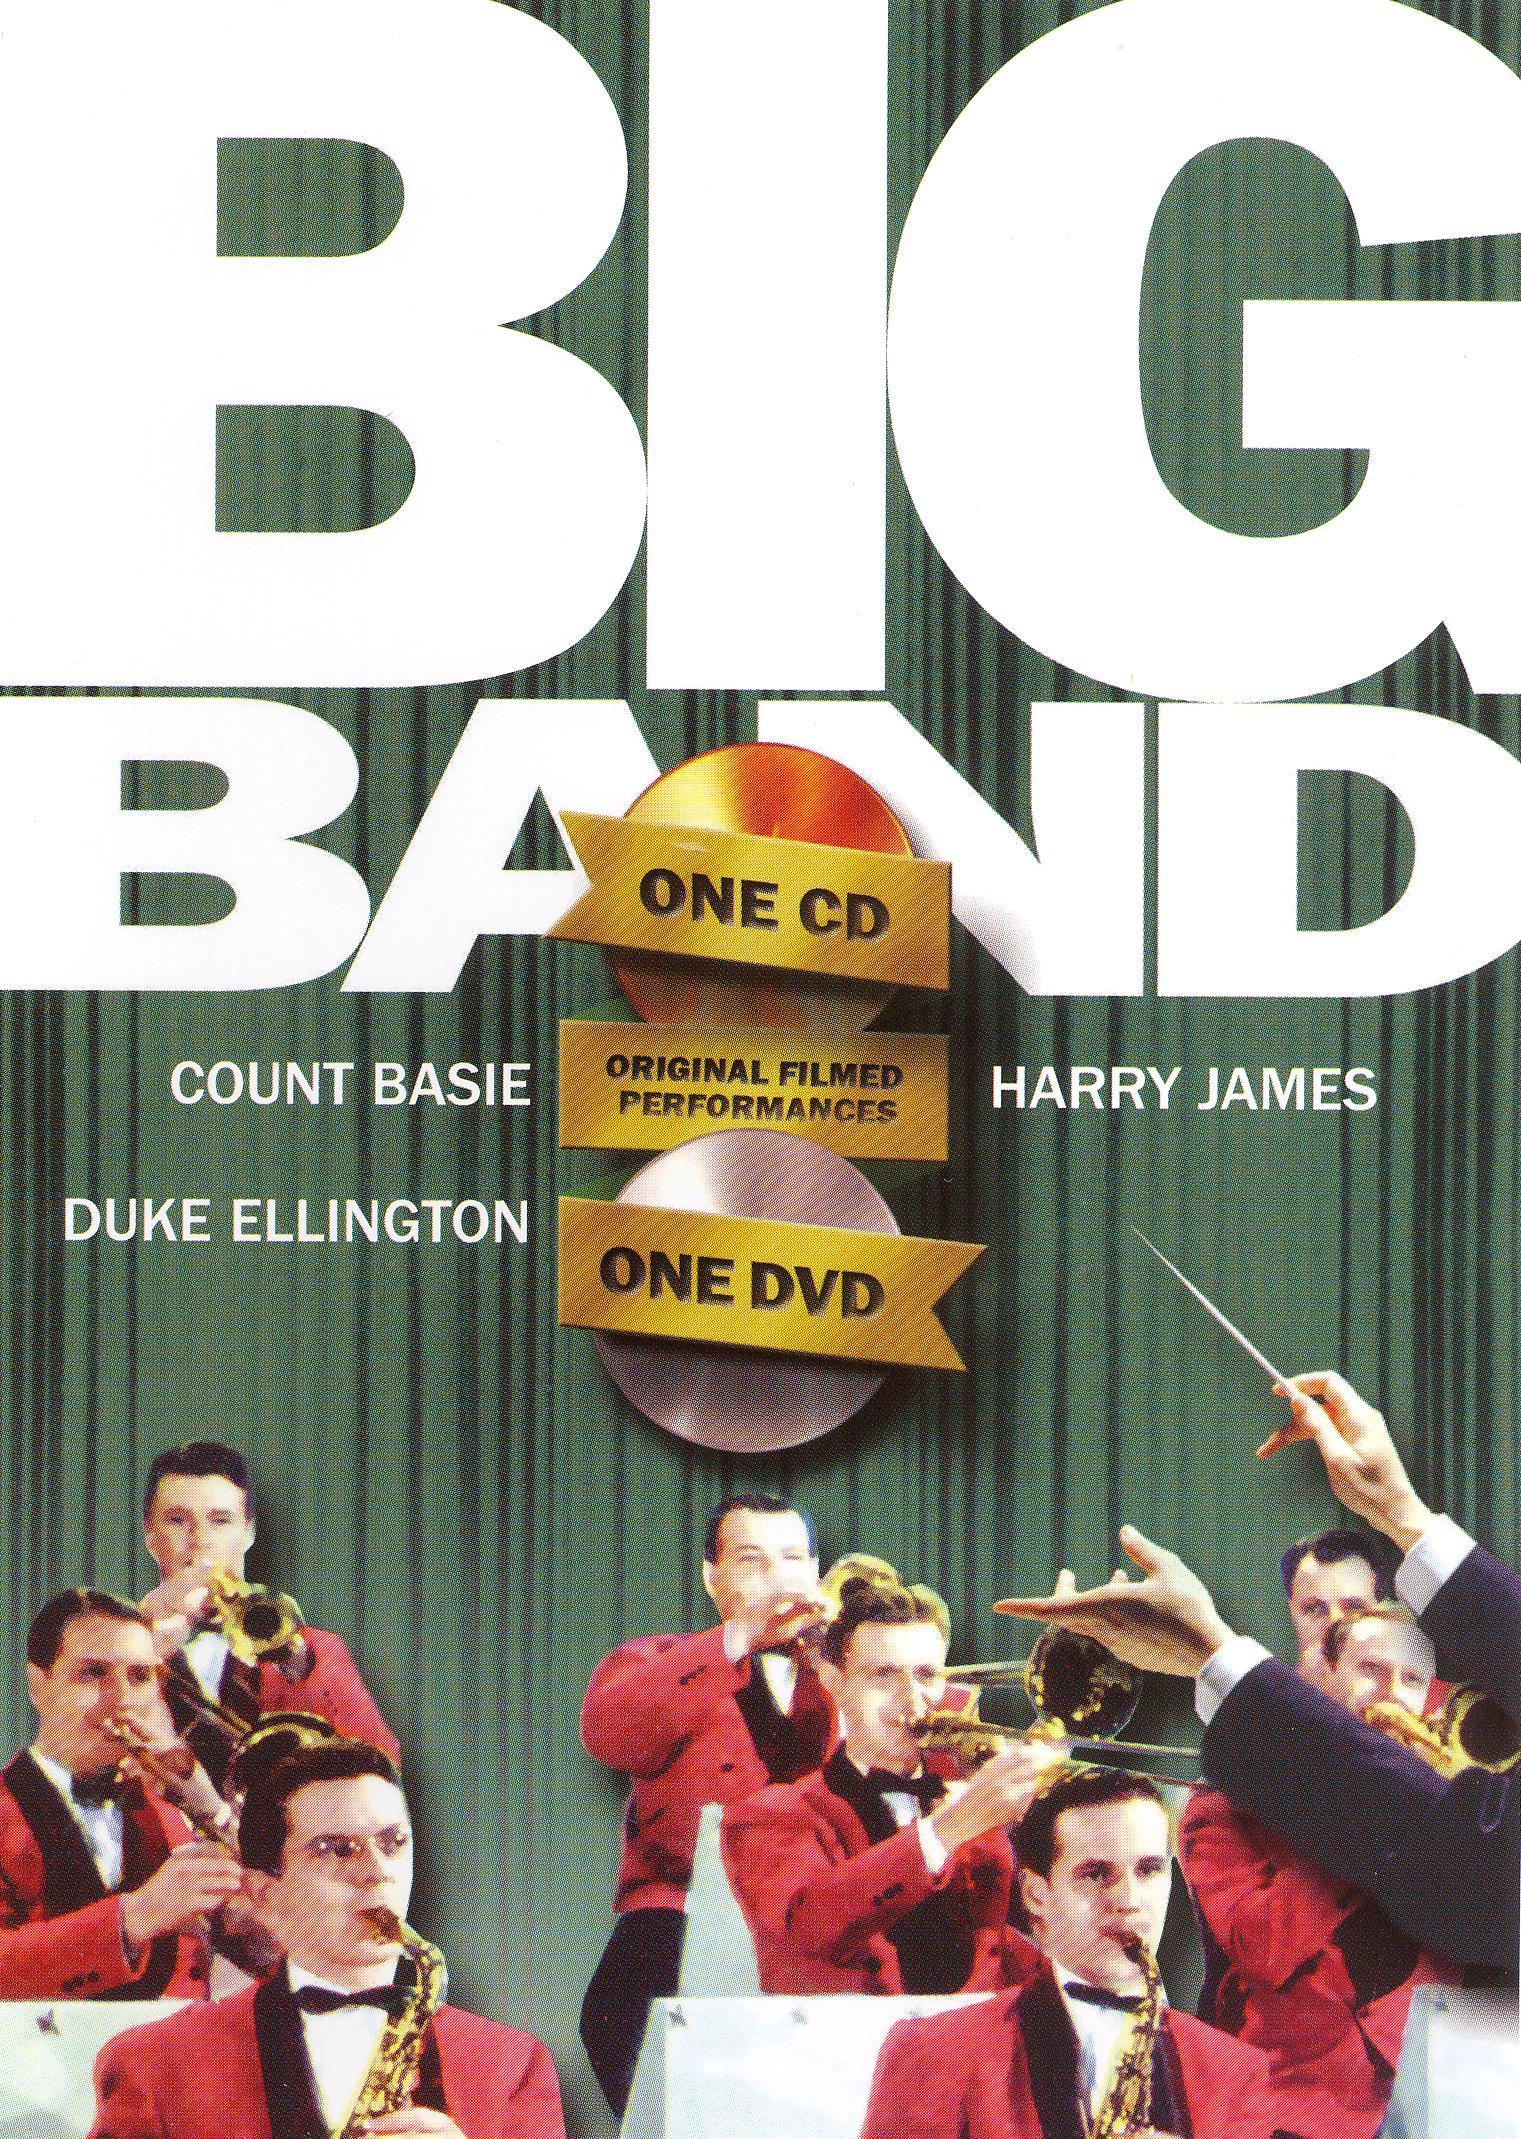 Count Basie/Duke Ellington Orchestra: Big Band